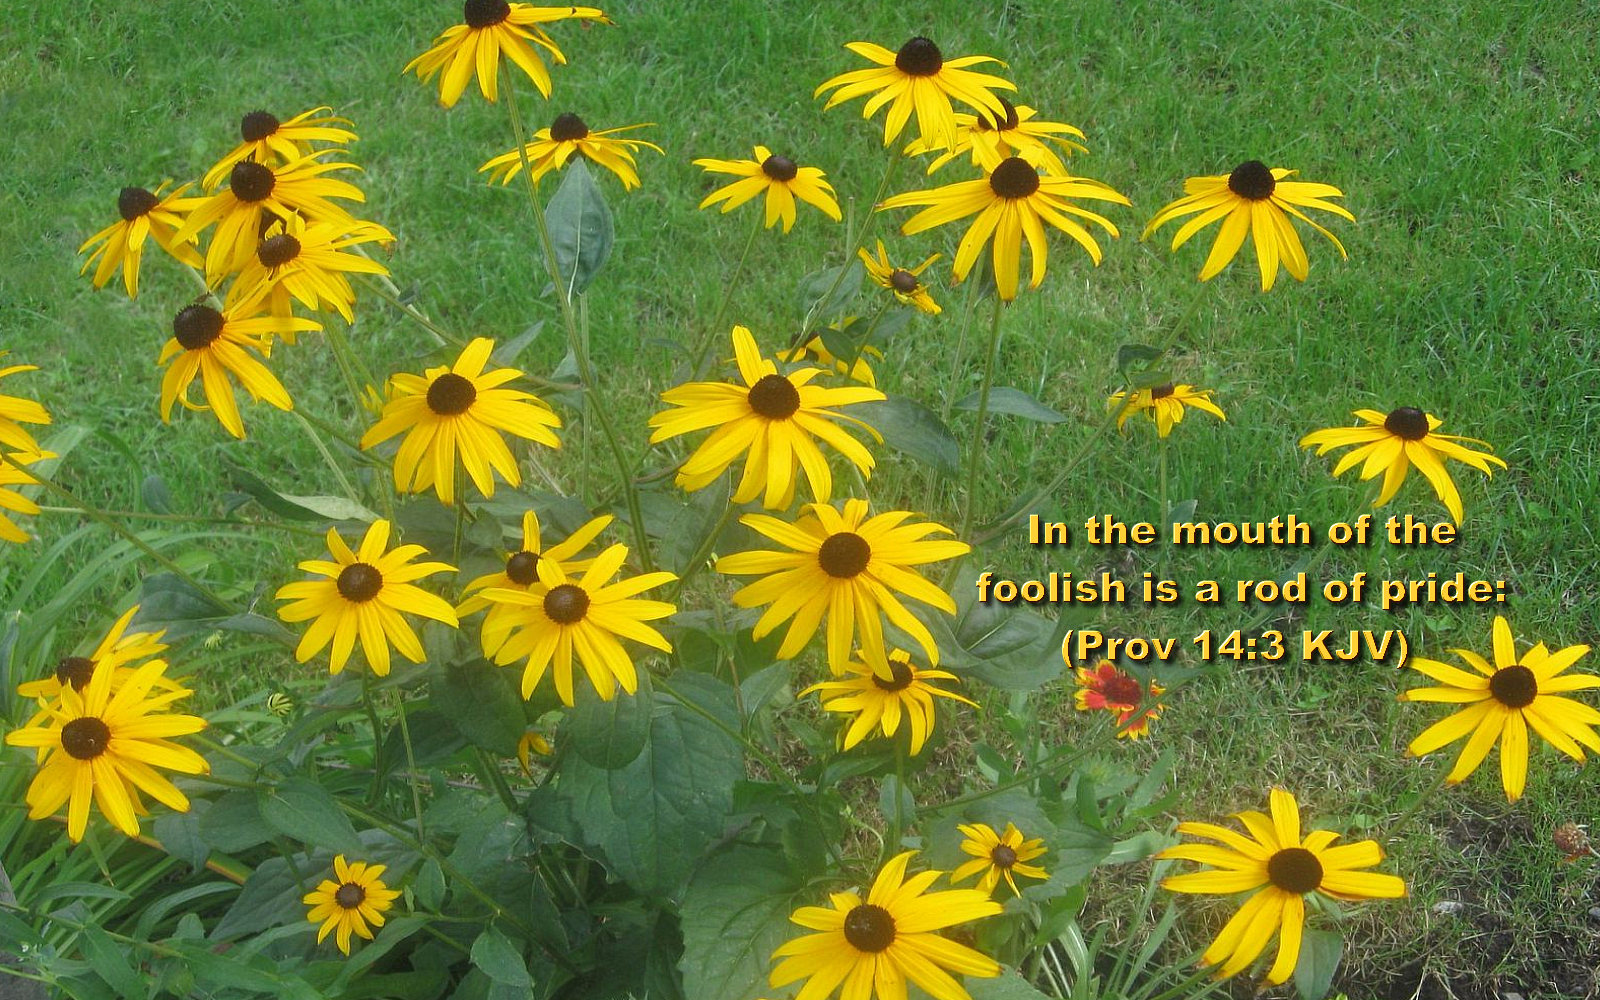 bible verses wallpaperjpg 1600x1000